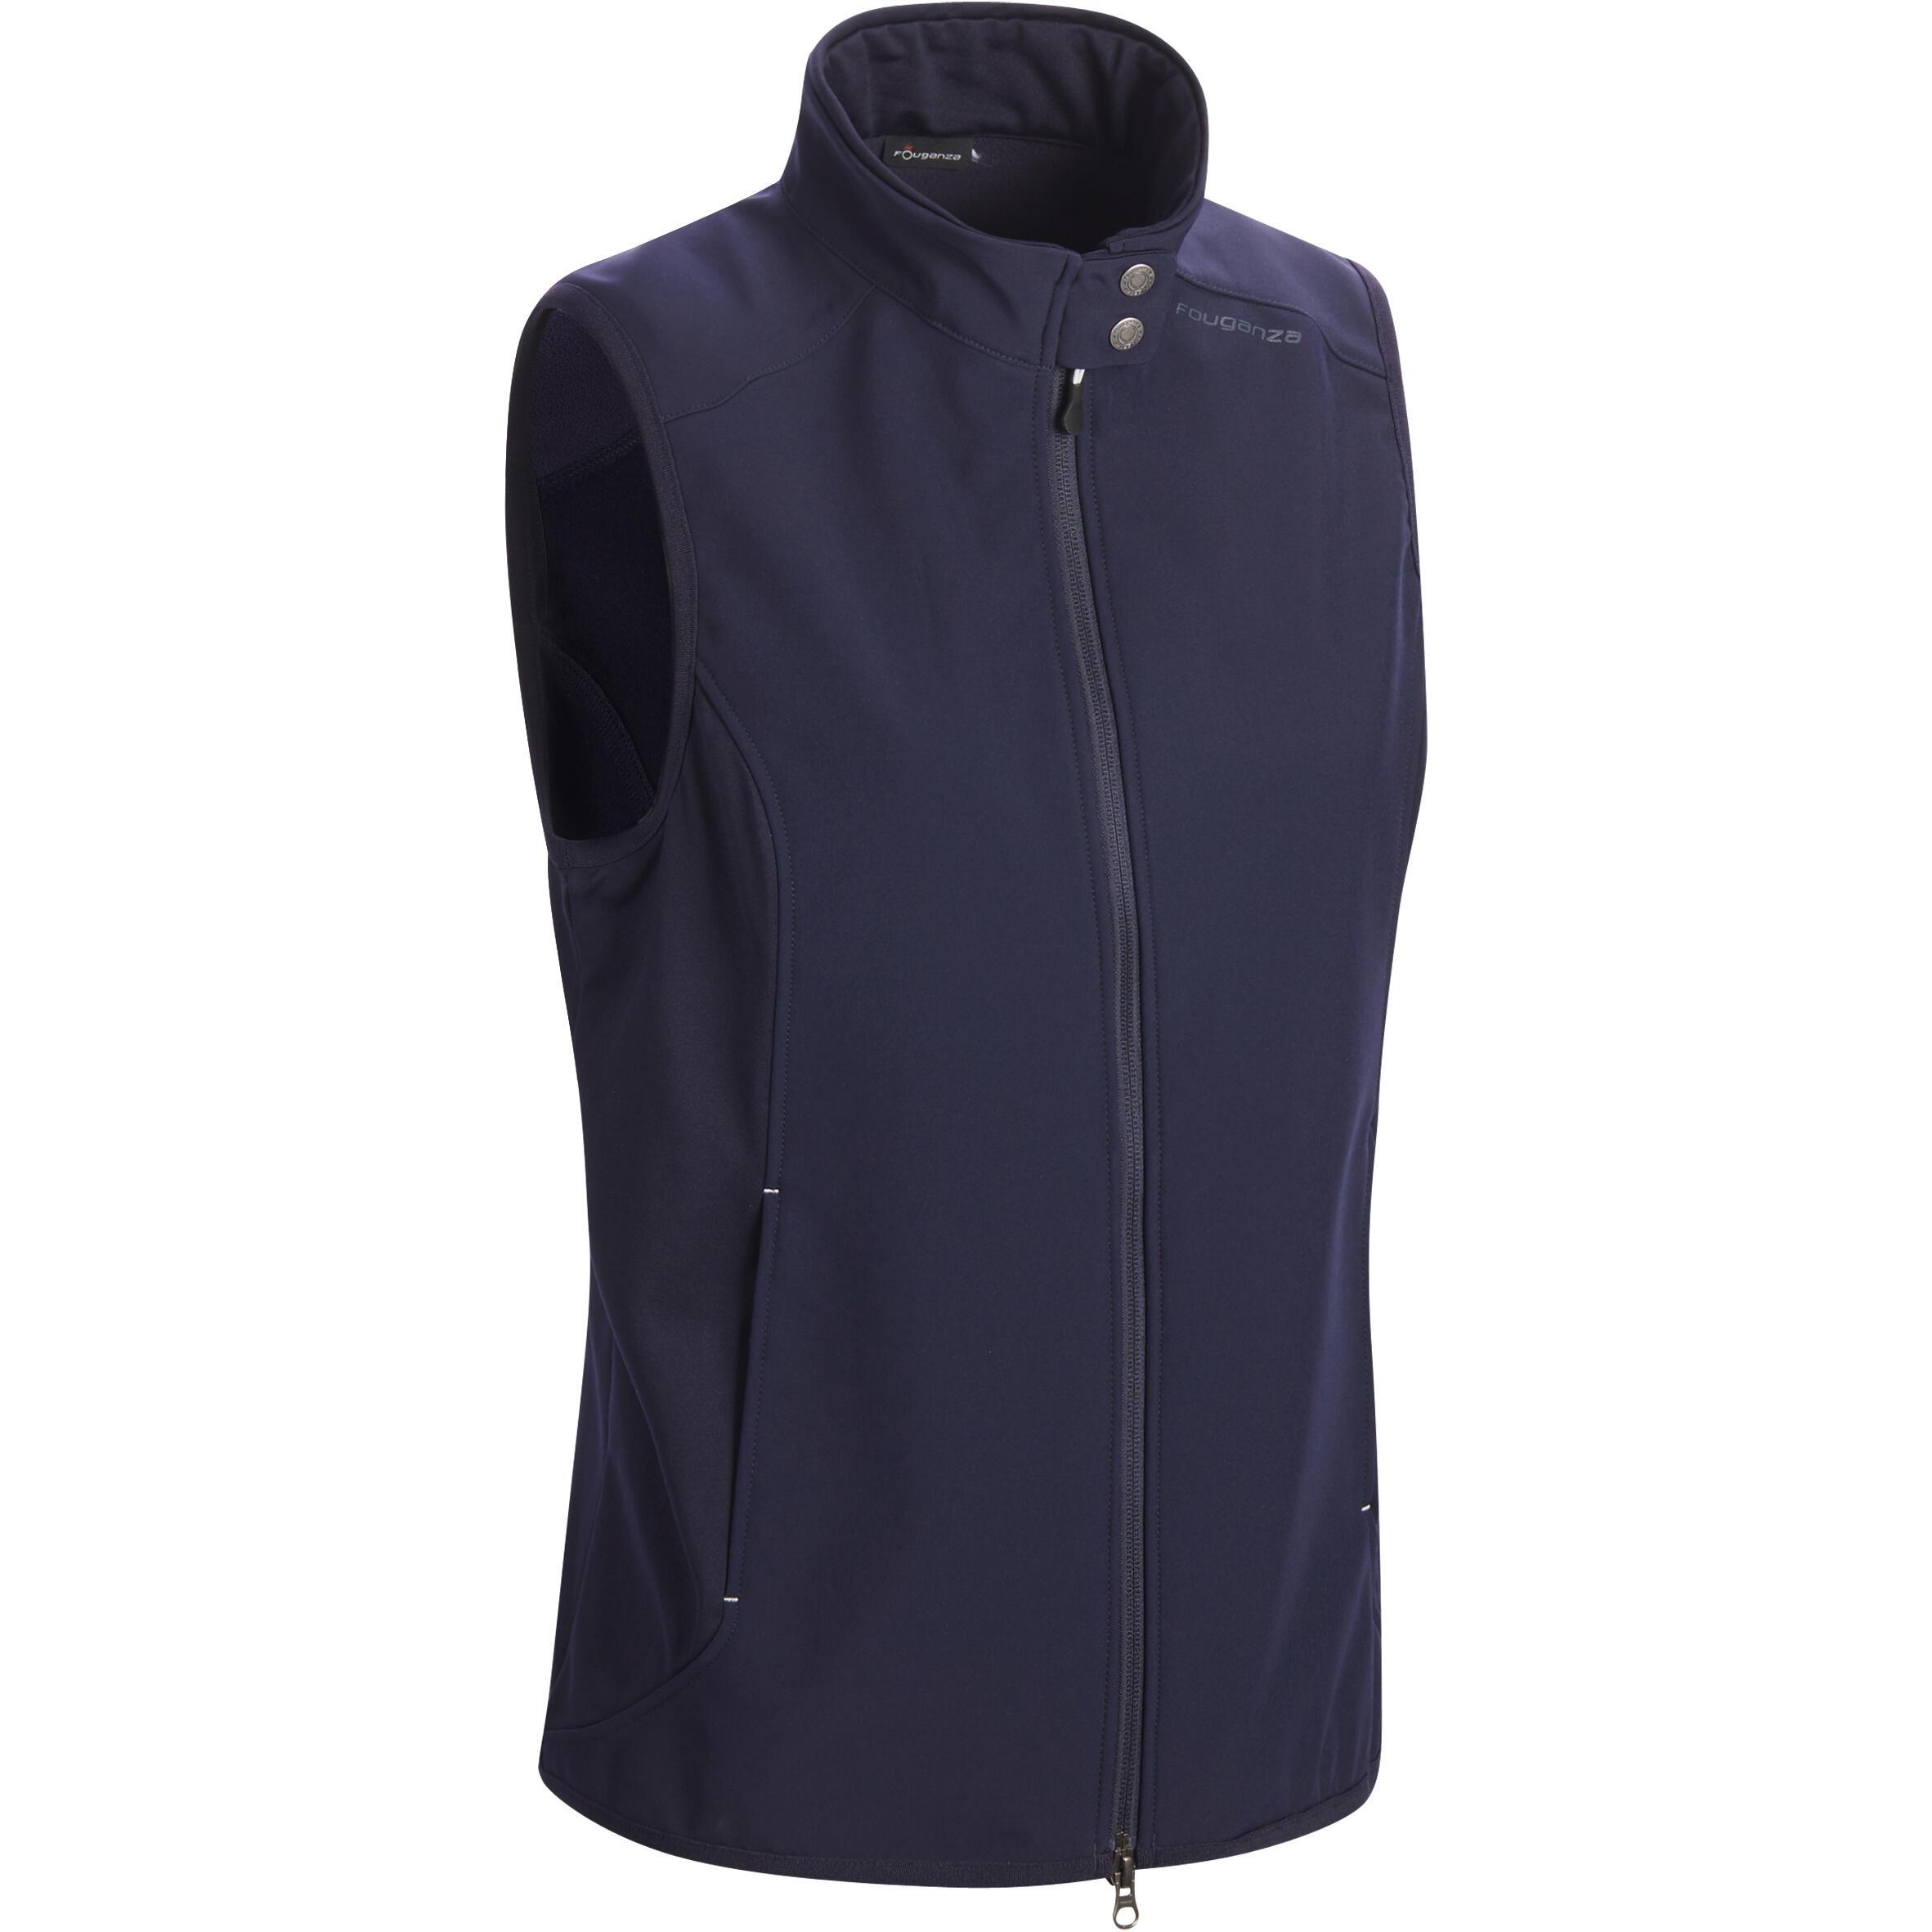 Fouganza Bodywarmer dames ruitersport GL500 marineblauw